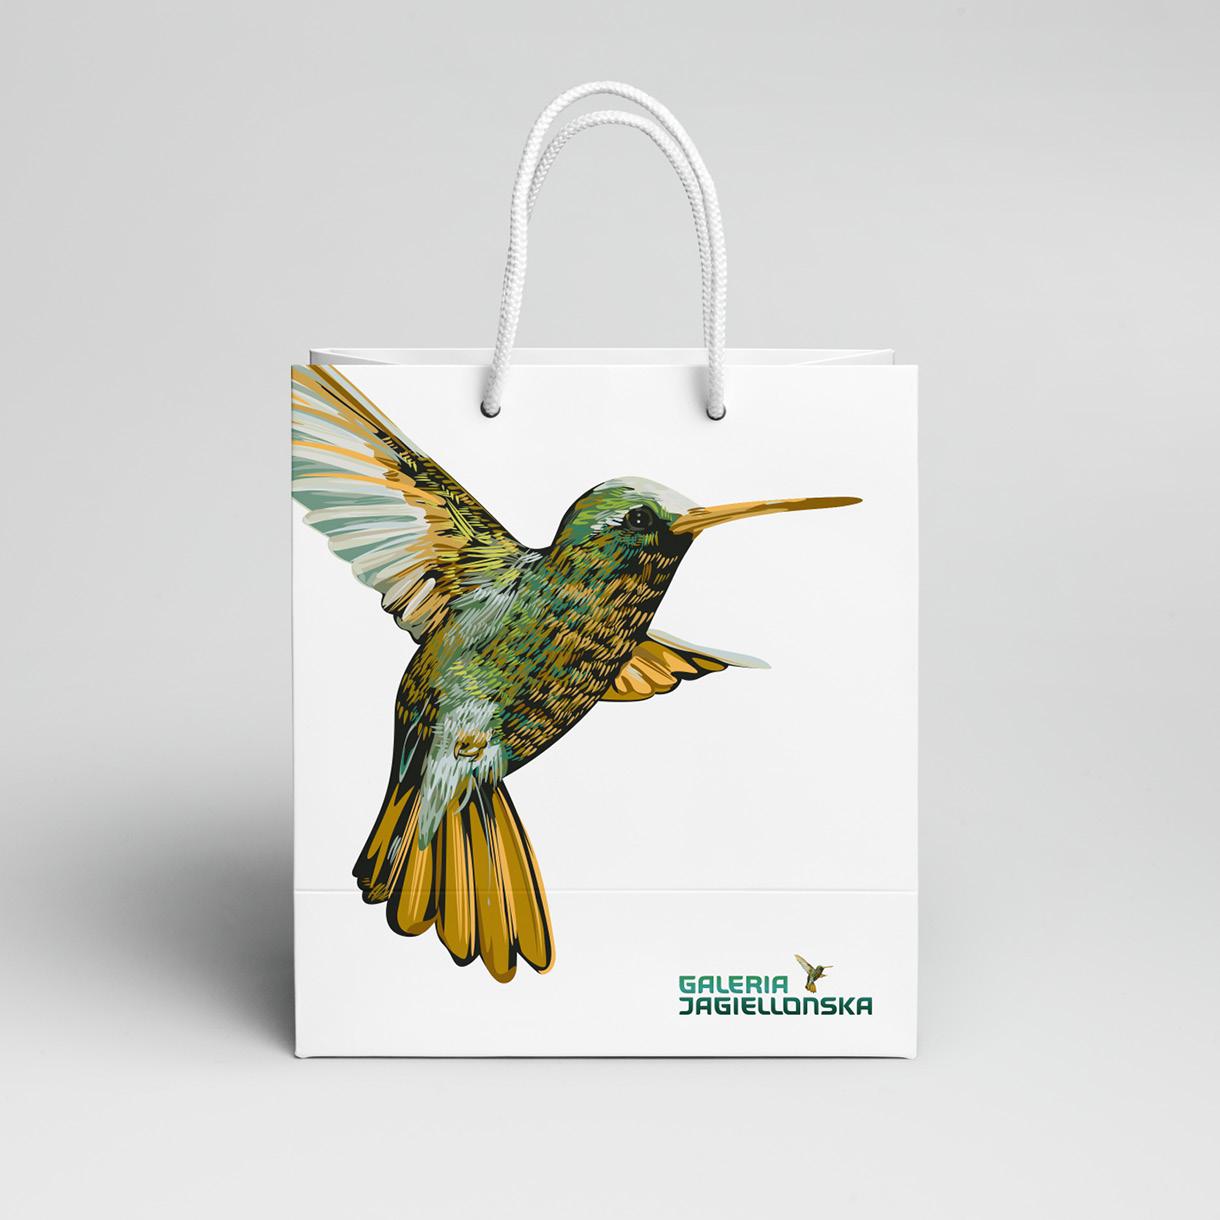 galeria jagielońska - paper bag